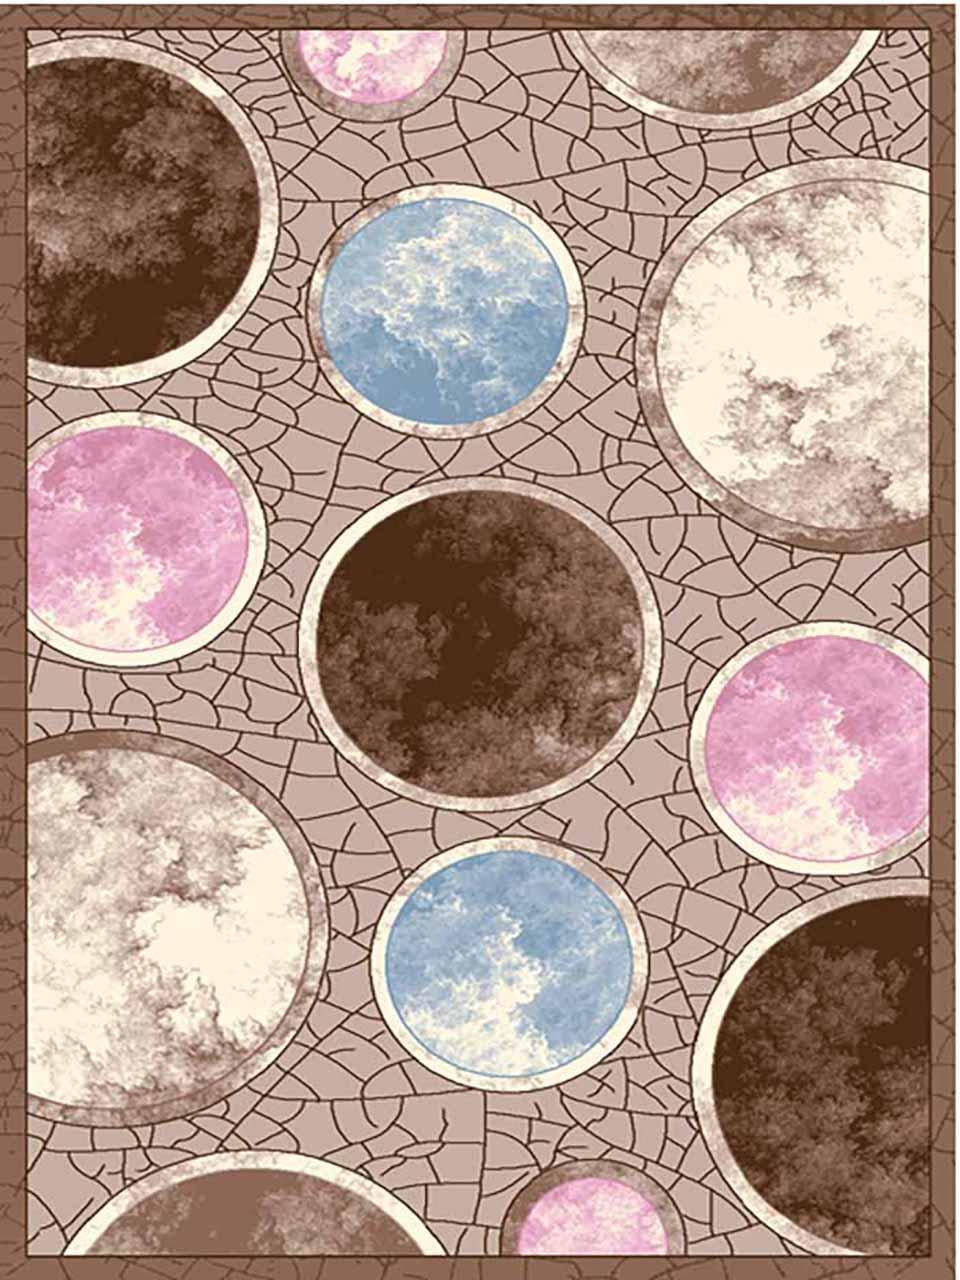 فرش (7009) پلی پرو پیلن - 8 رنگ - 410 شانه - قهوه ای - تراکم 1000